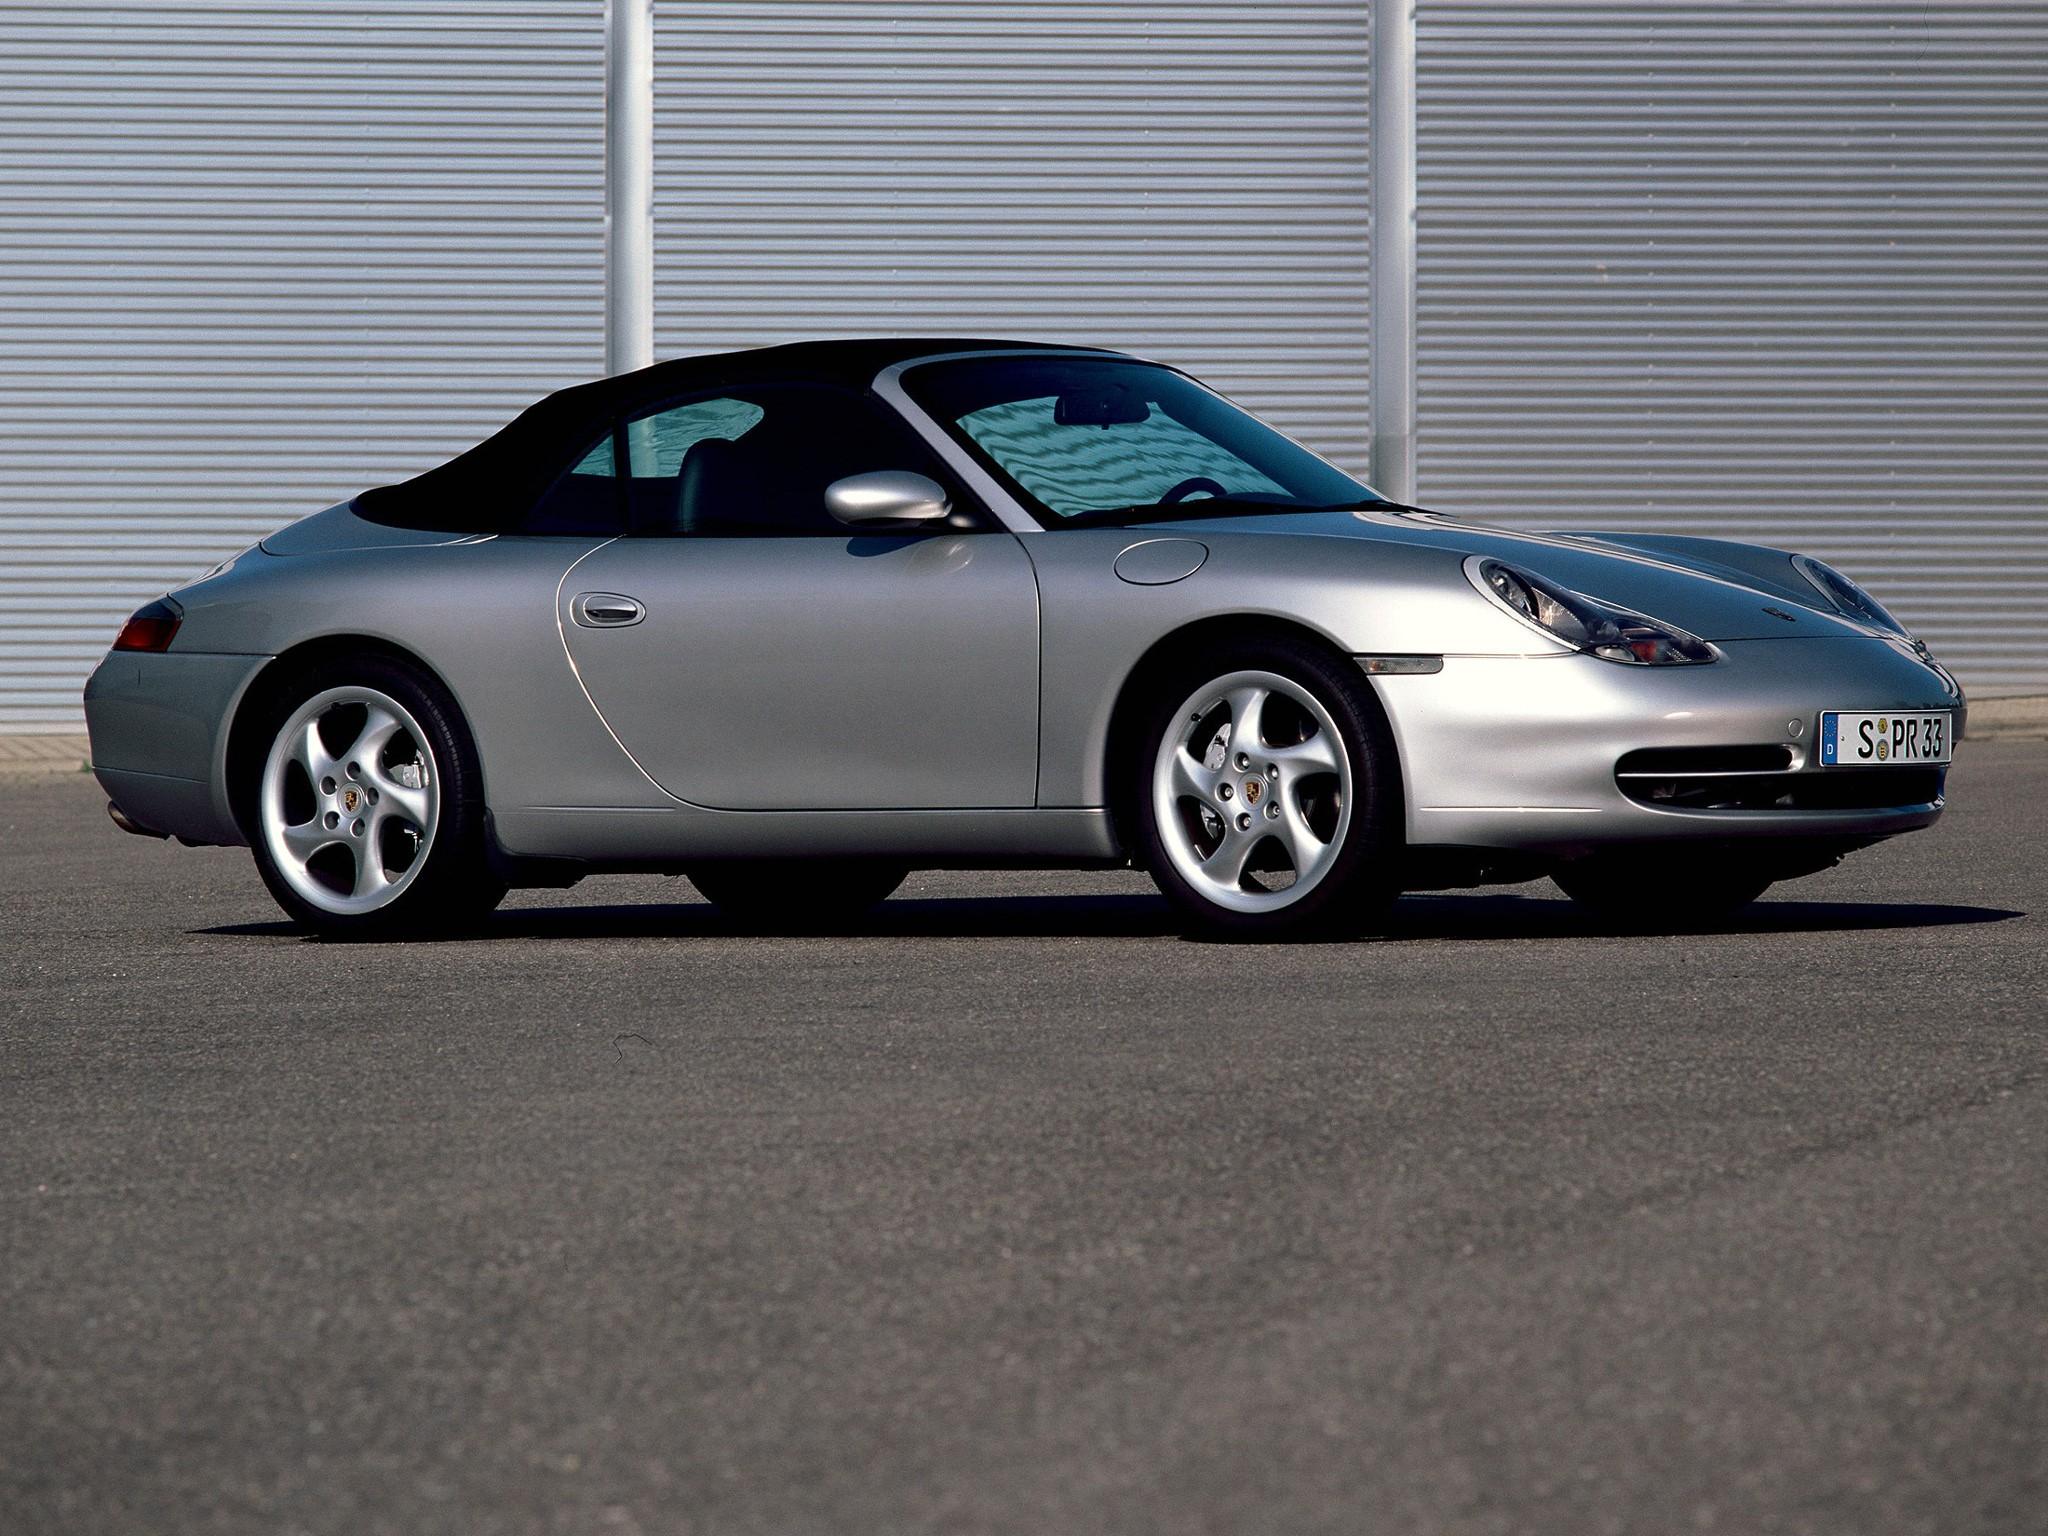 PORSCHE 911 Carrera 4 Cabriolet 996  1998, 1999, 2000, 2001